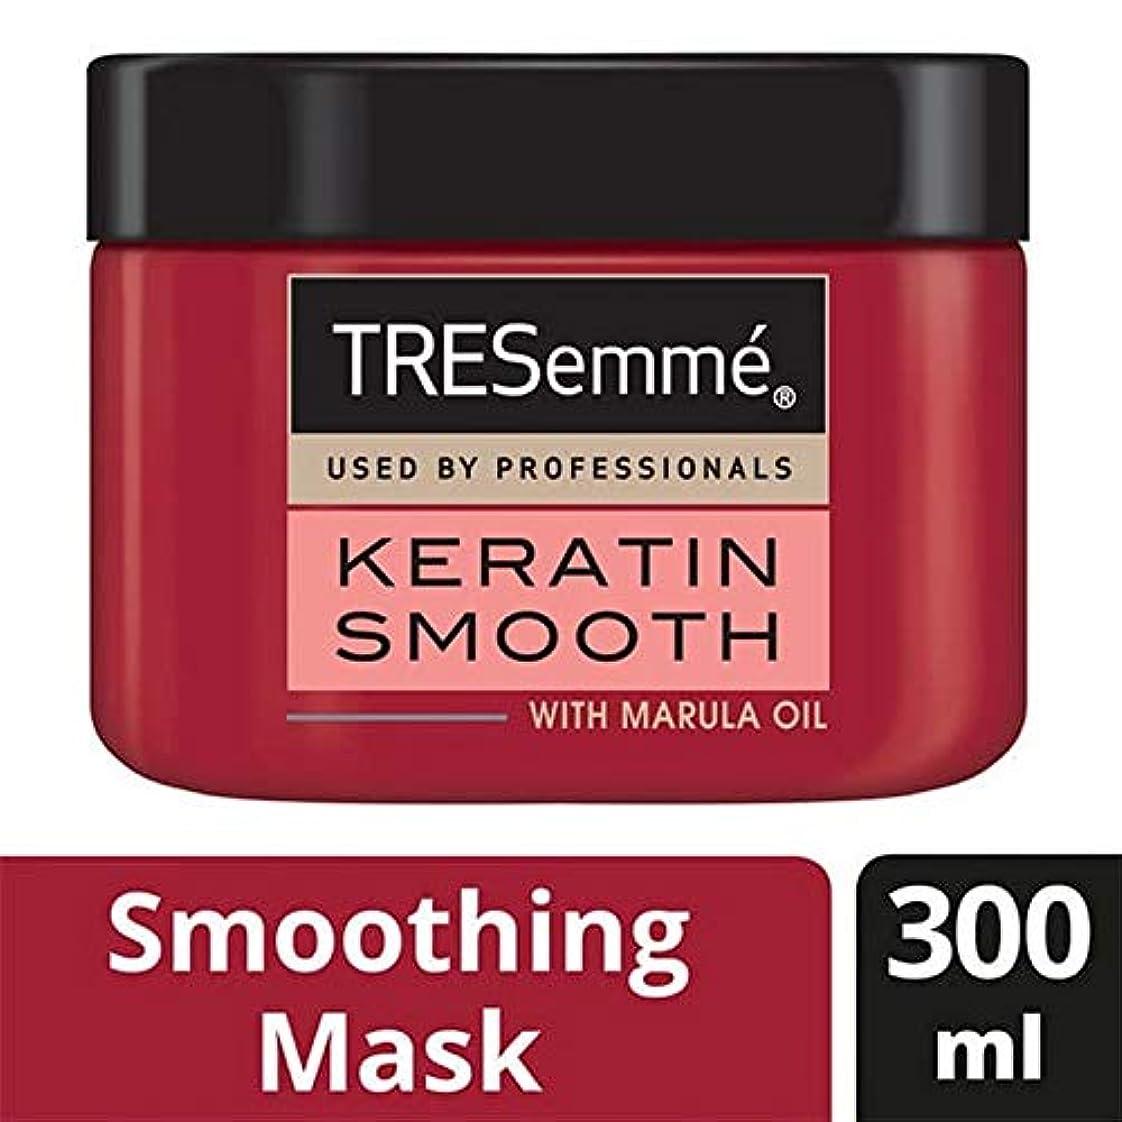 [Tresemme] Tresemm?ケラチンなめらかなマスク300ミリリットル - TRESemm? Keratin Smooth Mask 300ml [並行輸入品]